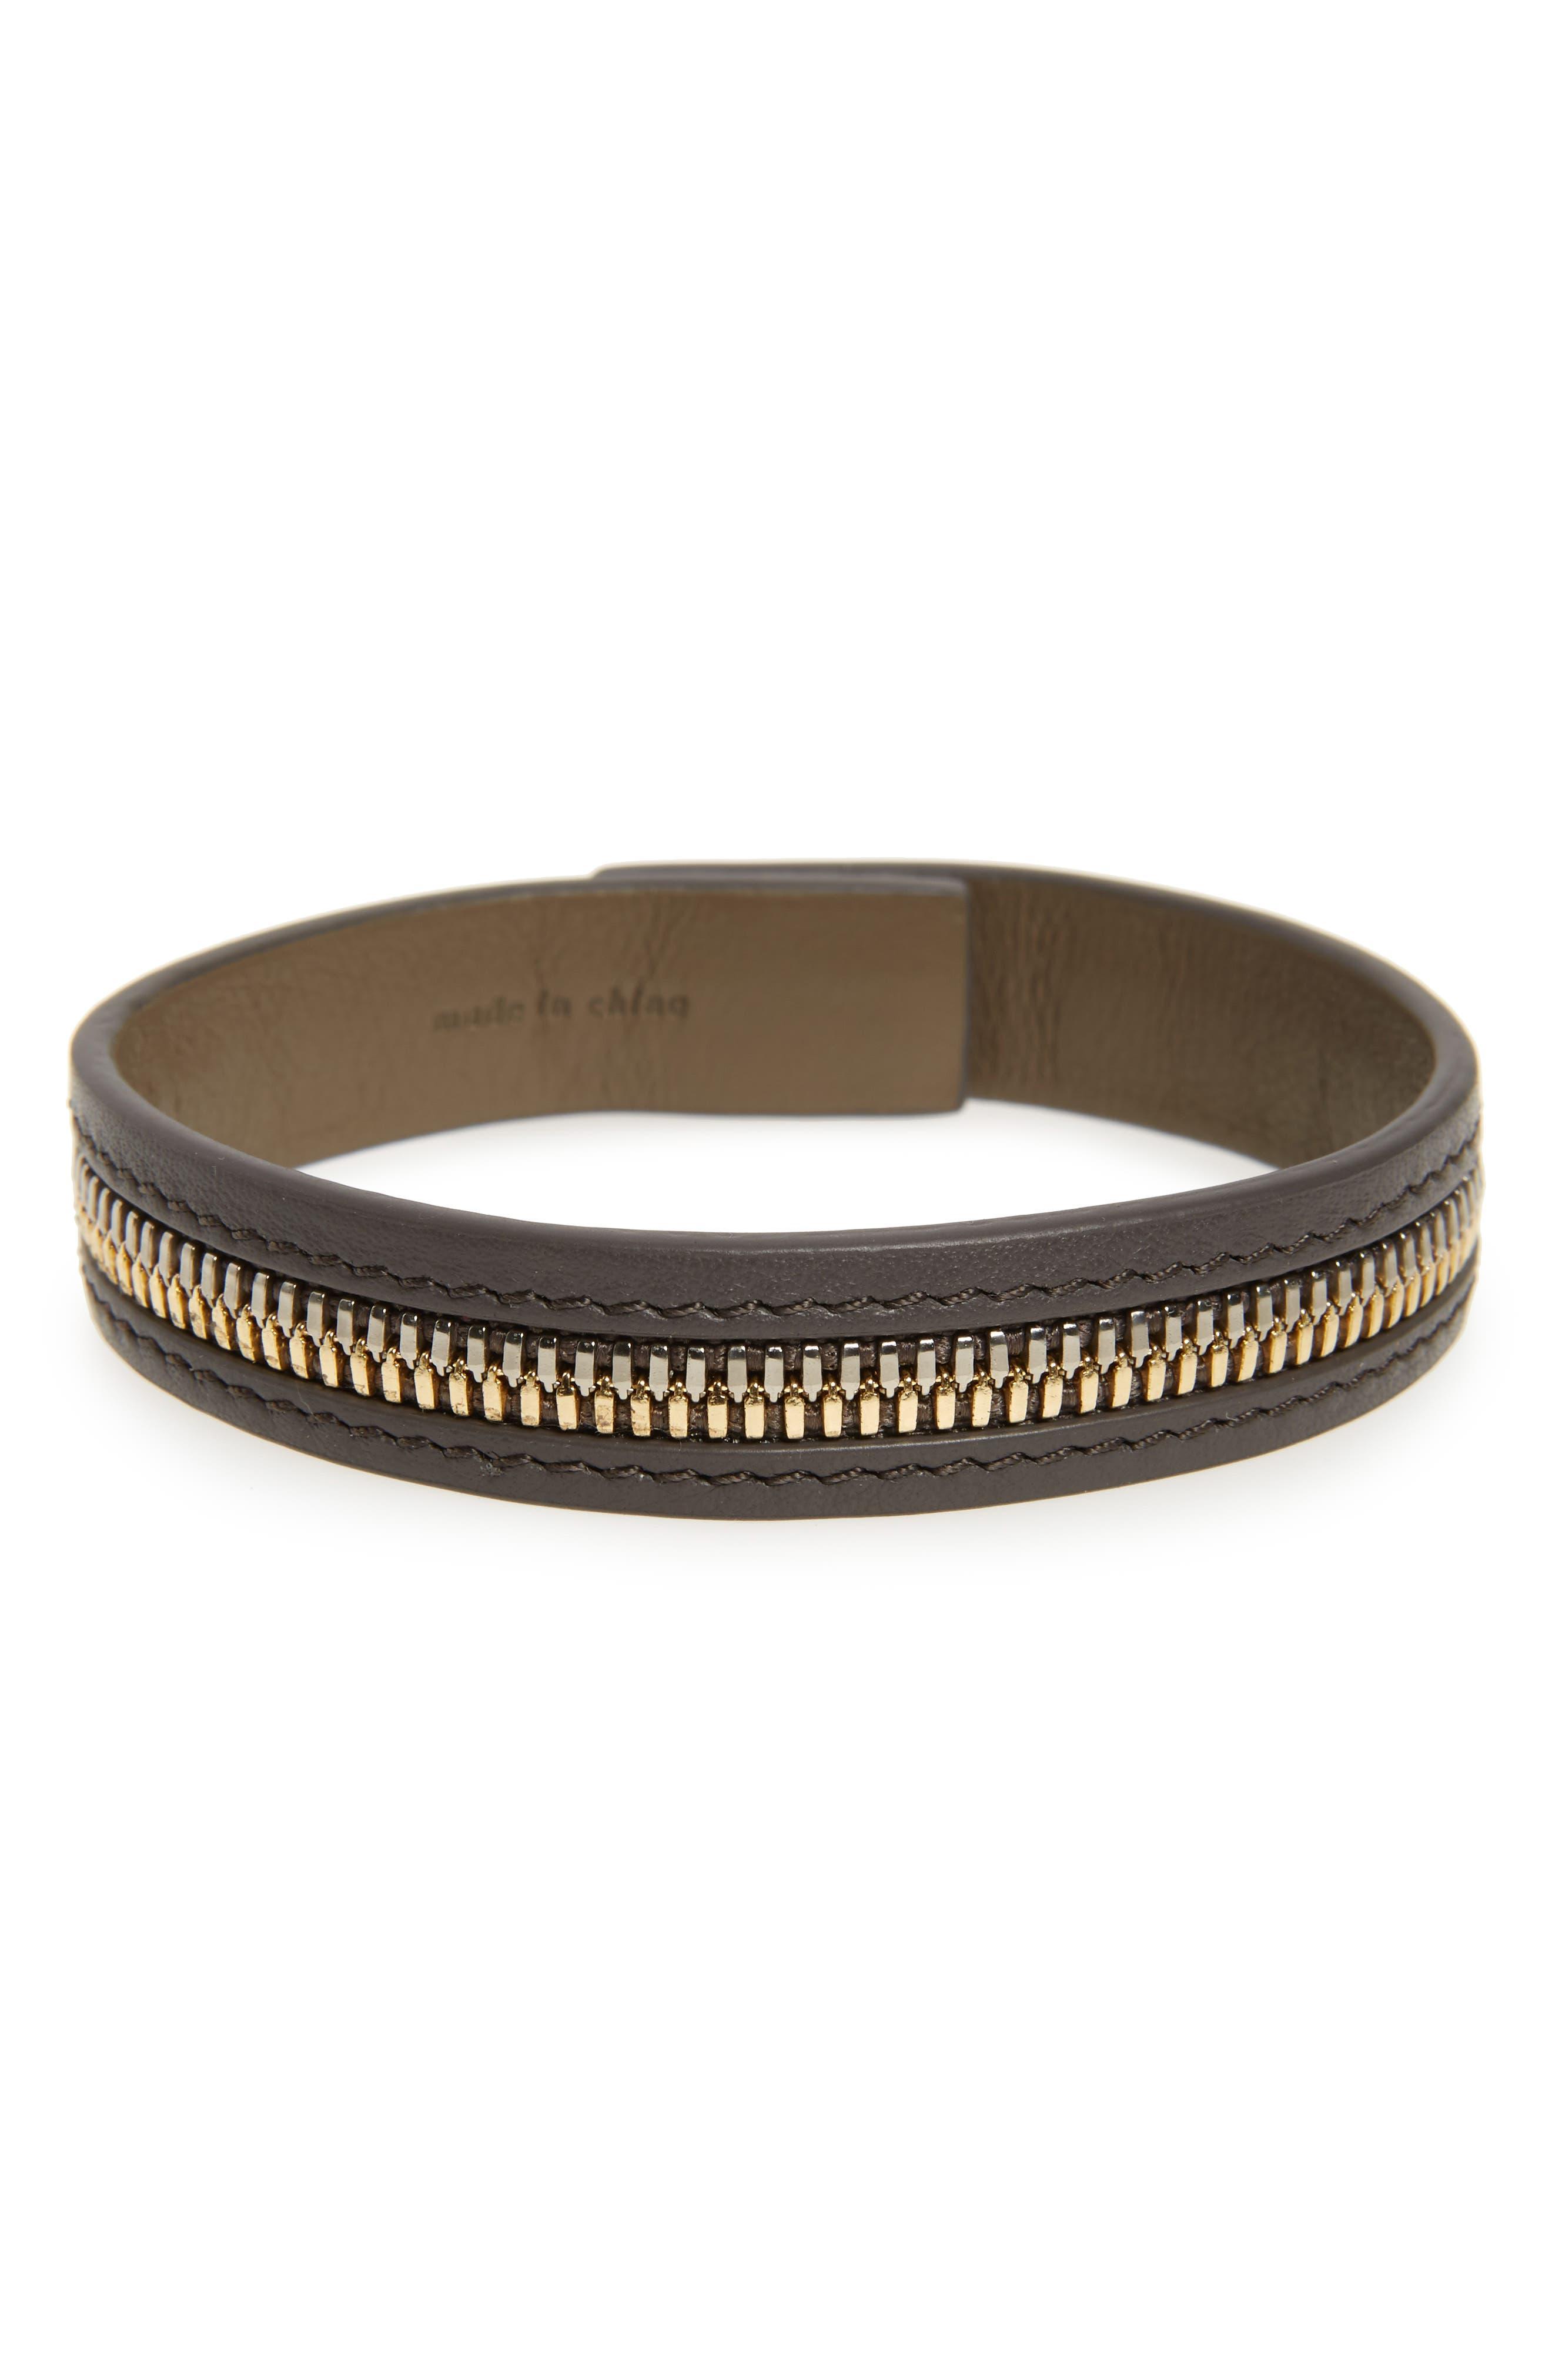 WANT LES ESSENTIELS Tambo Zip Leather Bracelet